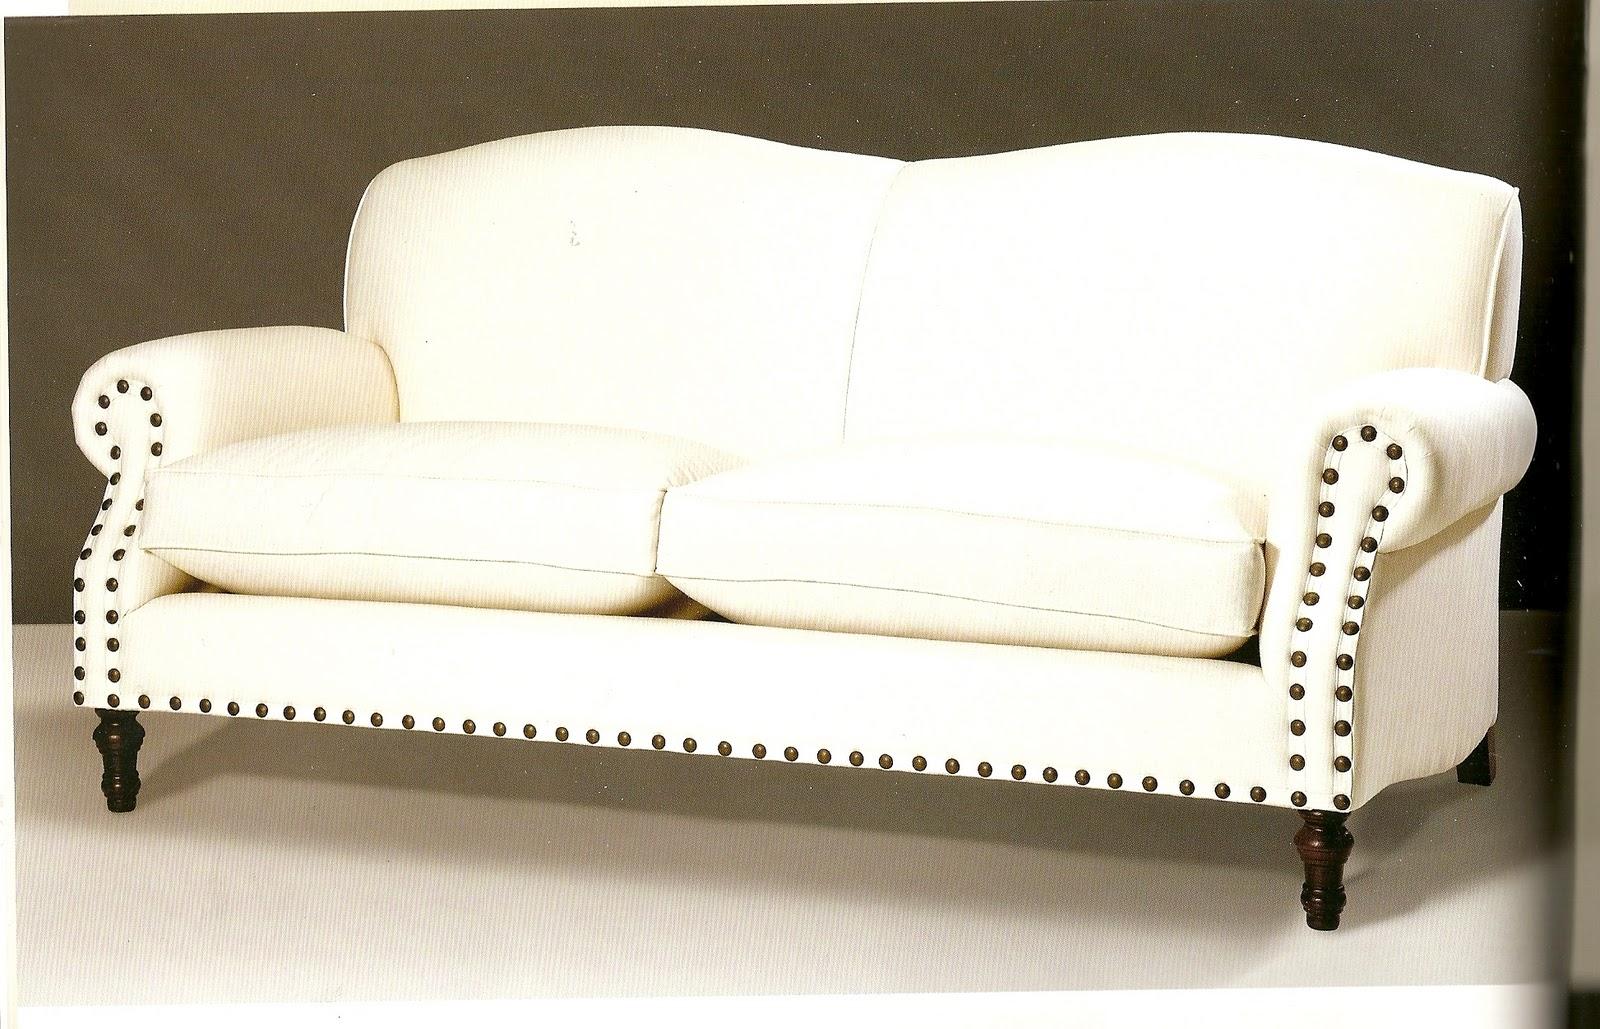 recouvrir son canape maison design. Black Bedroom Furniture Sets. Home Design Ideas